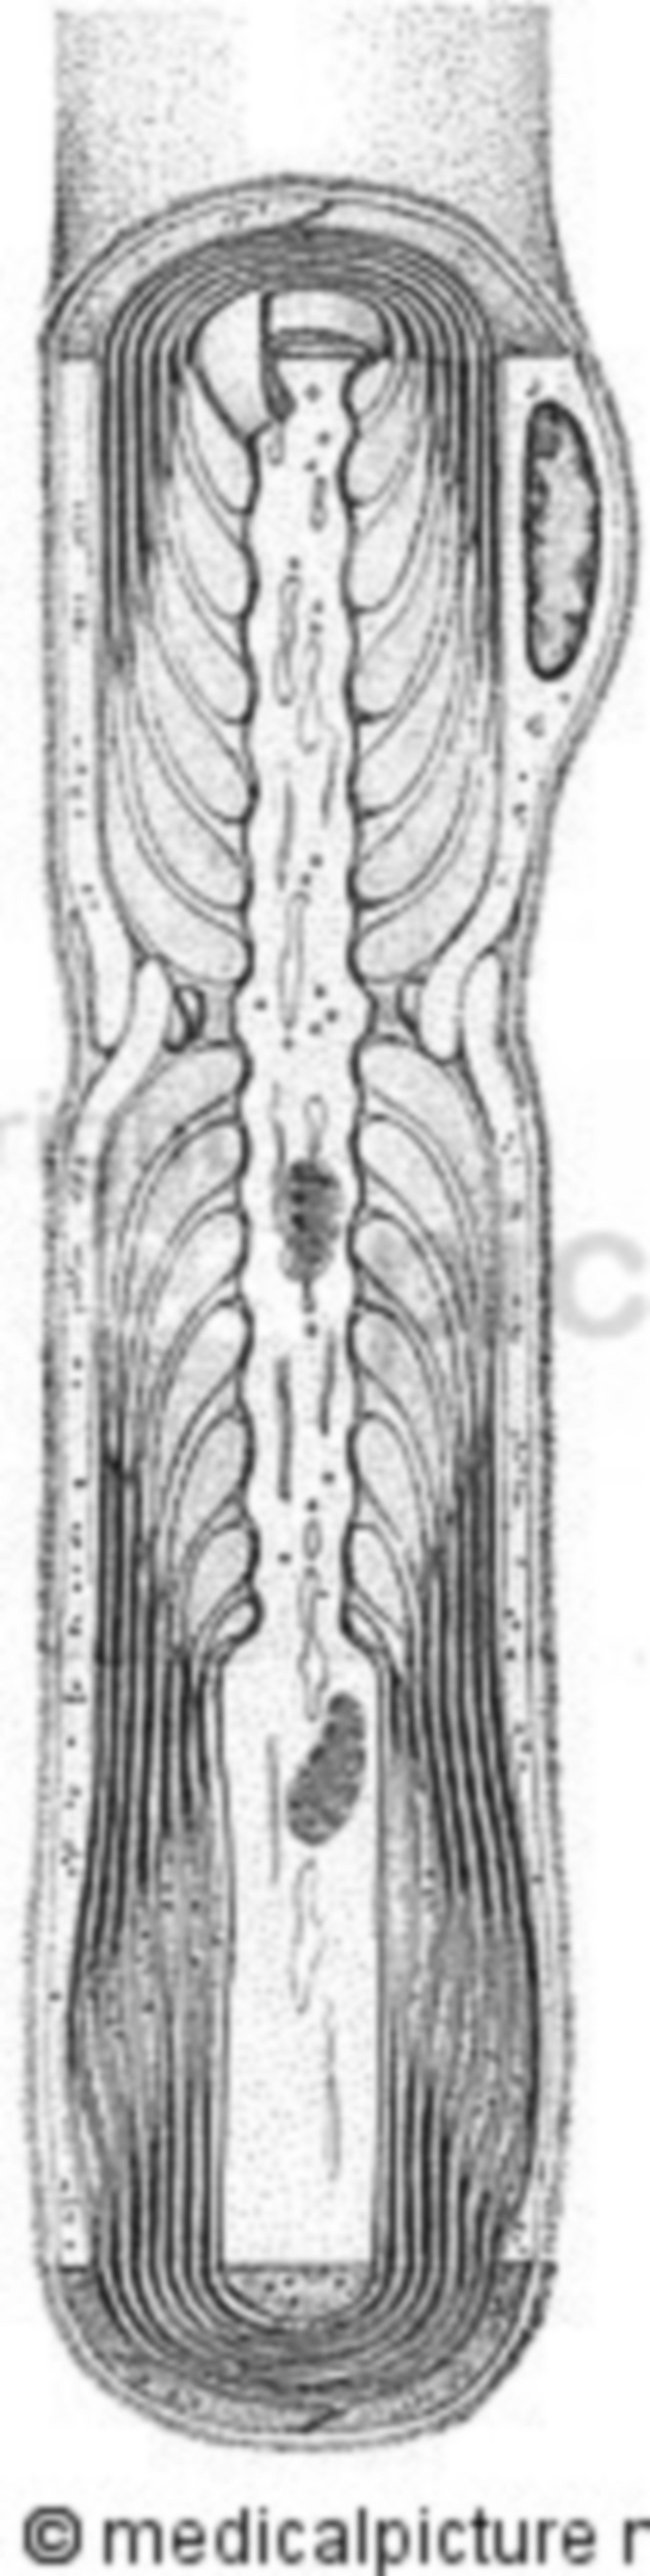 Nerve fiber with myelin sheaths